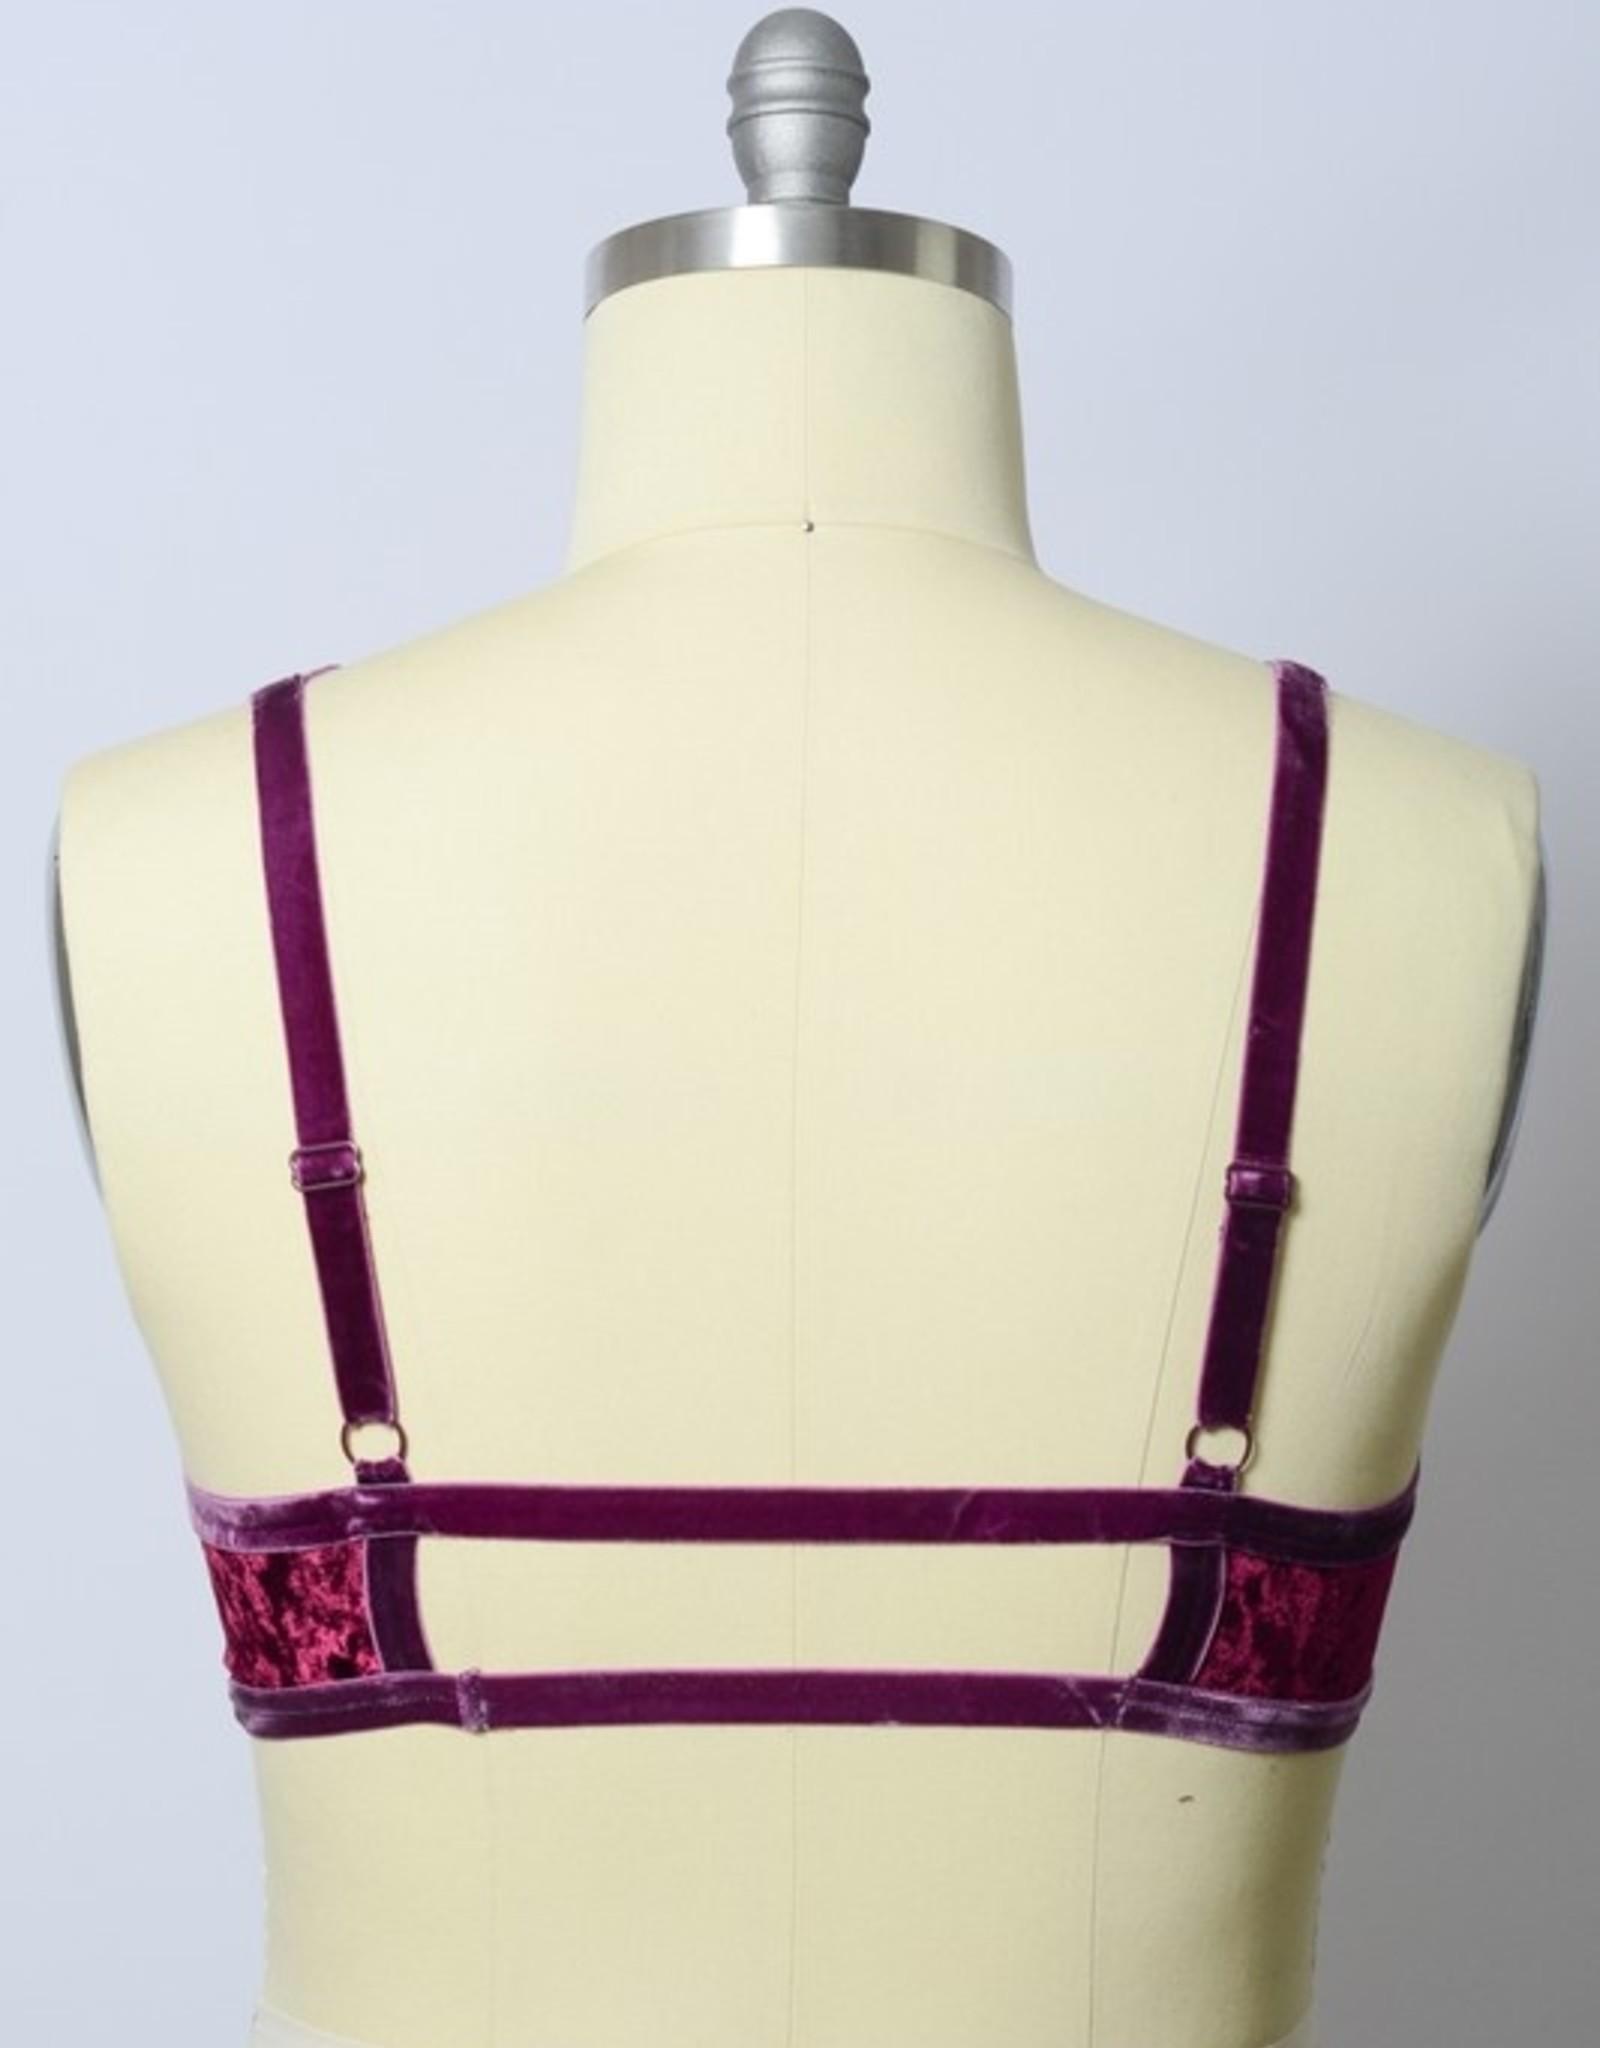 Leto Accessories Velvet Strappy Bralette Plus